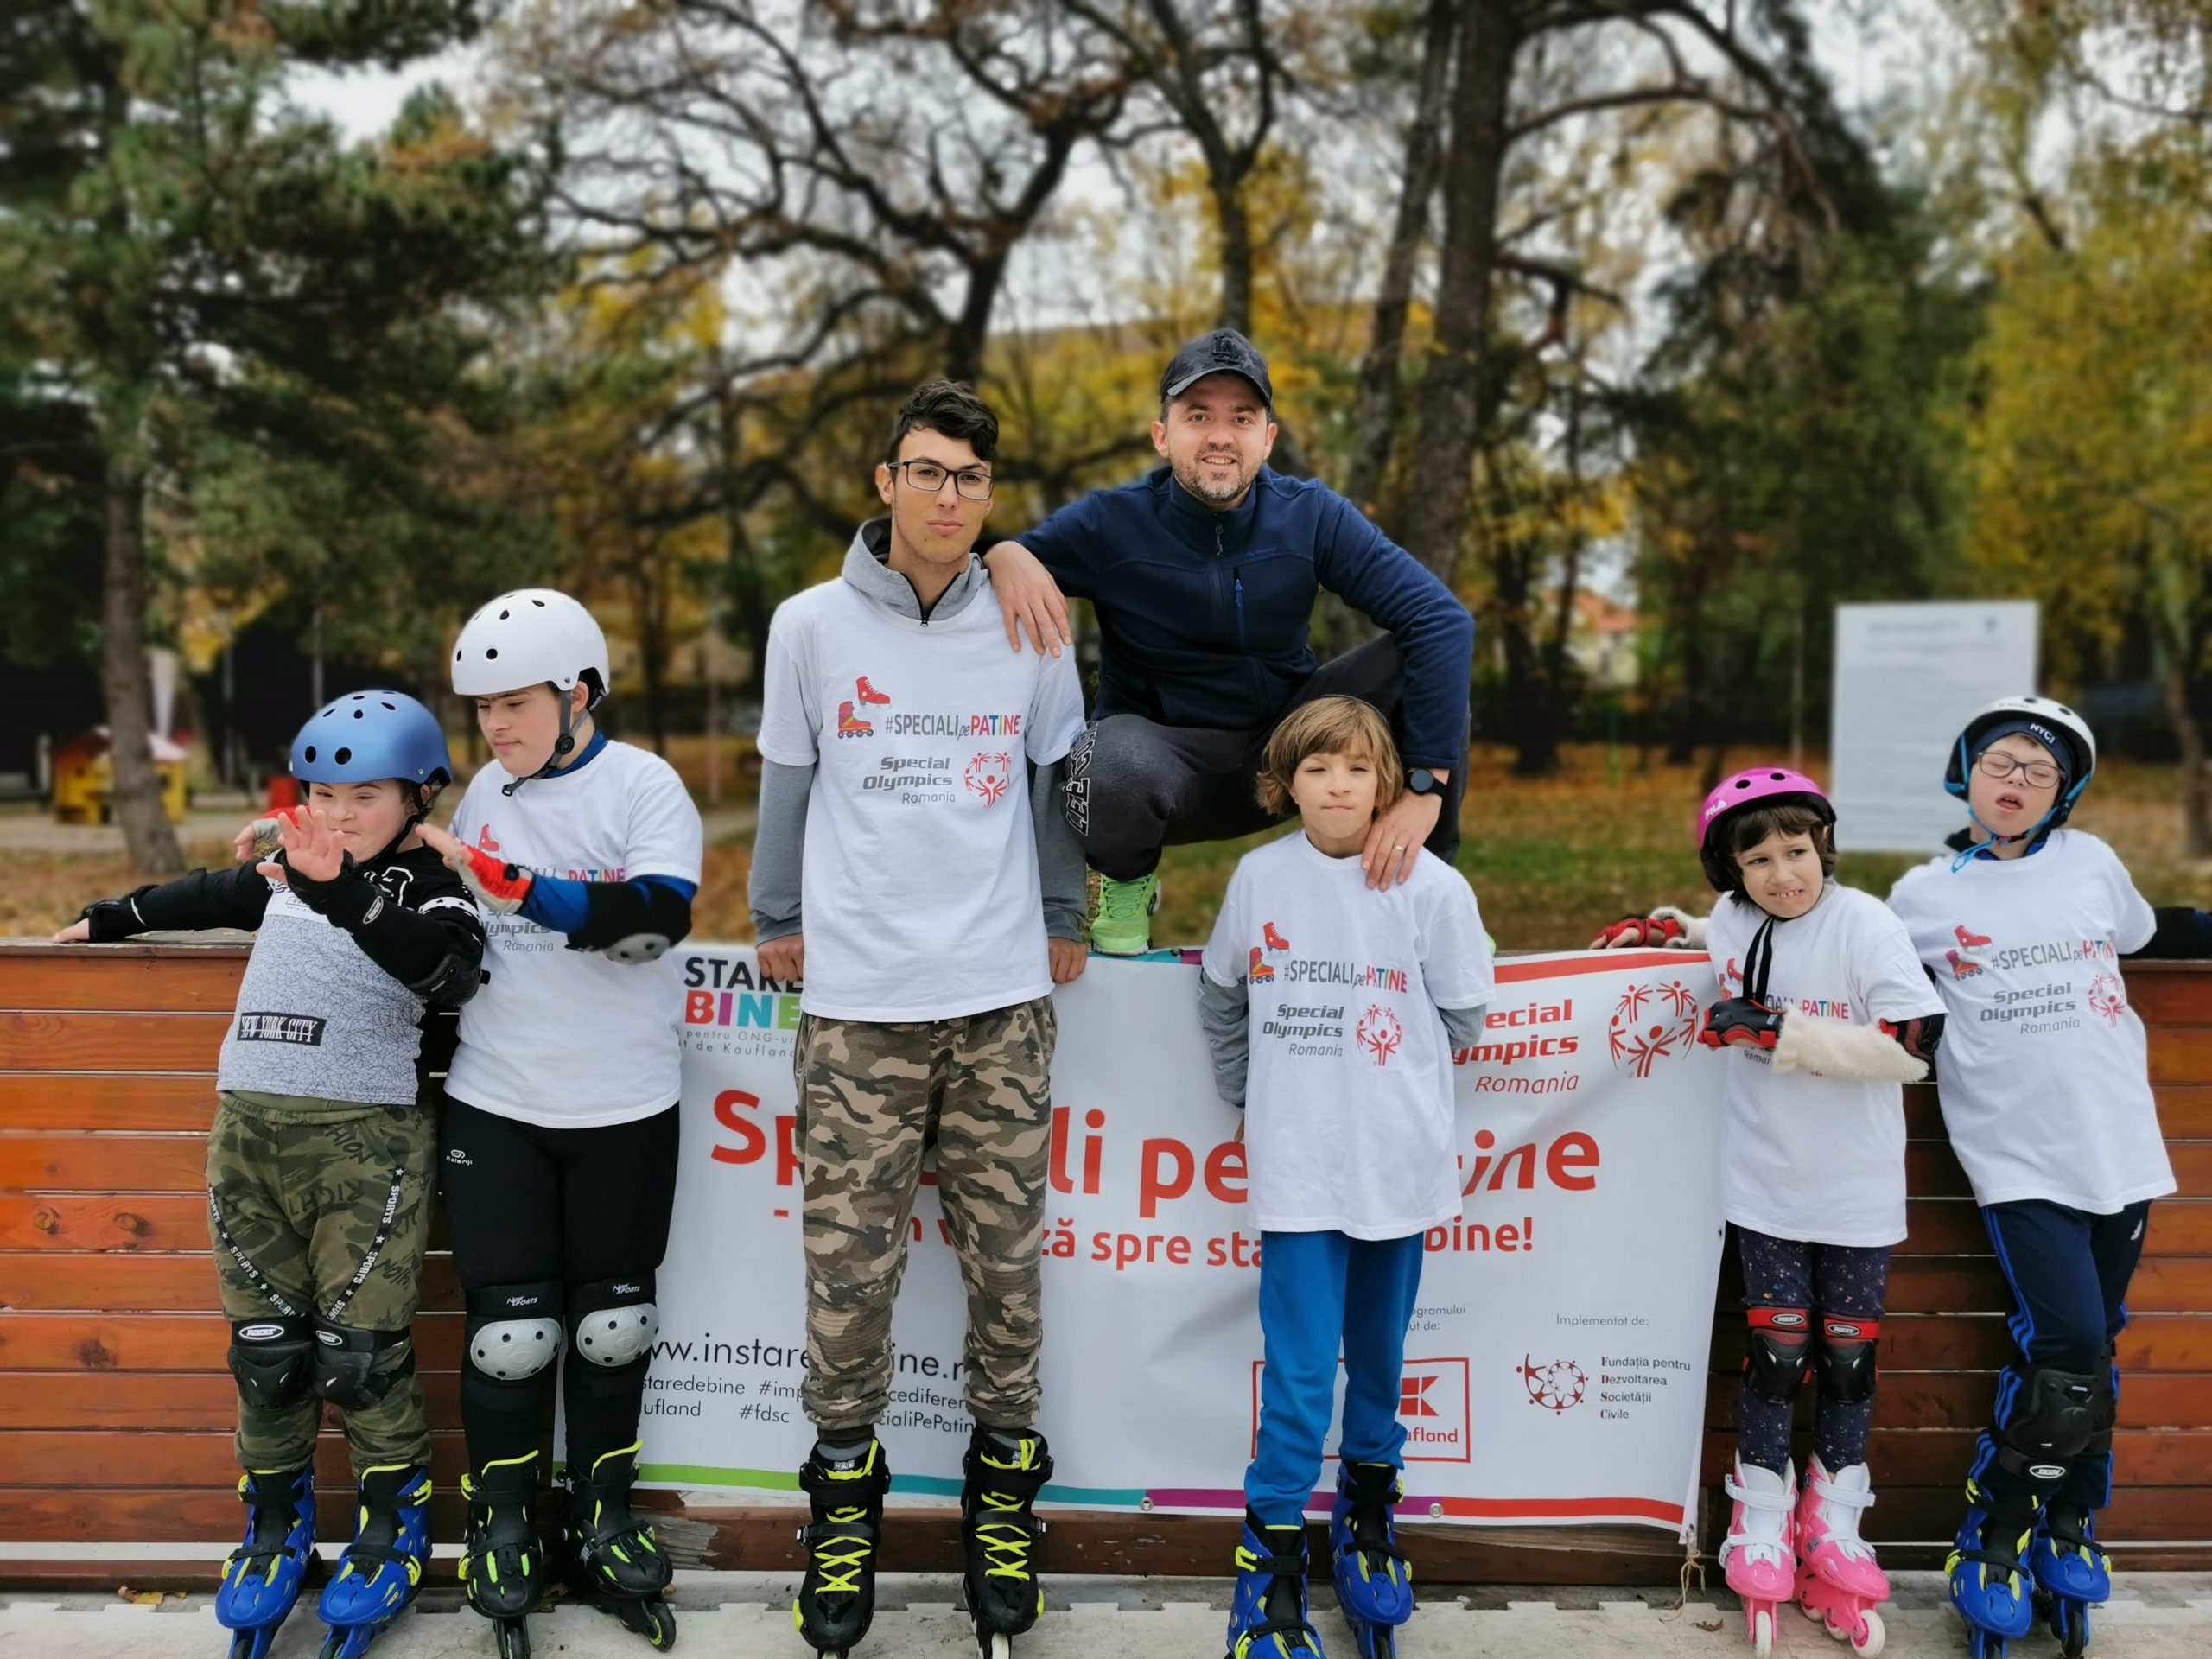 Speciali pe patine, Special Olympics, Timisoara (8)